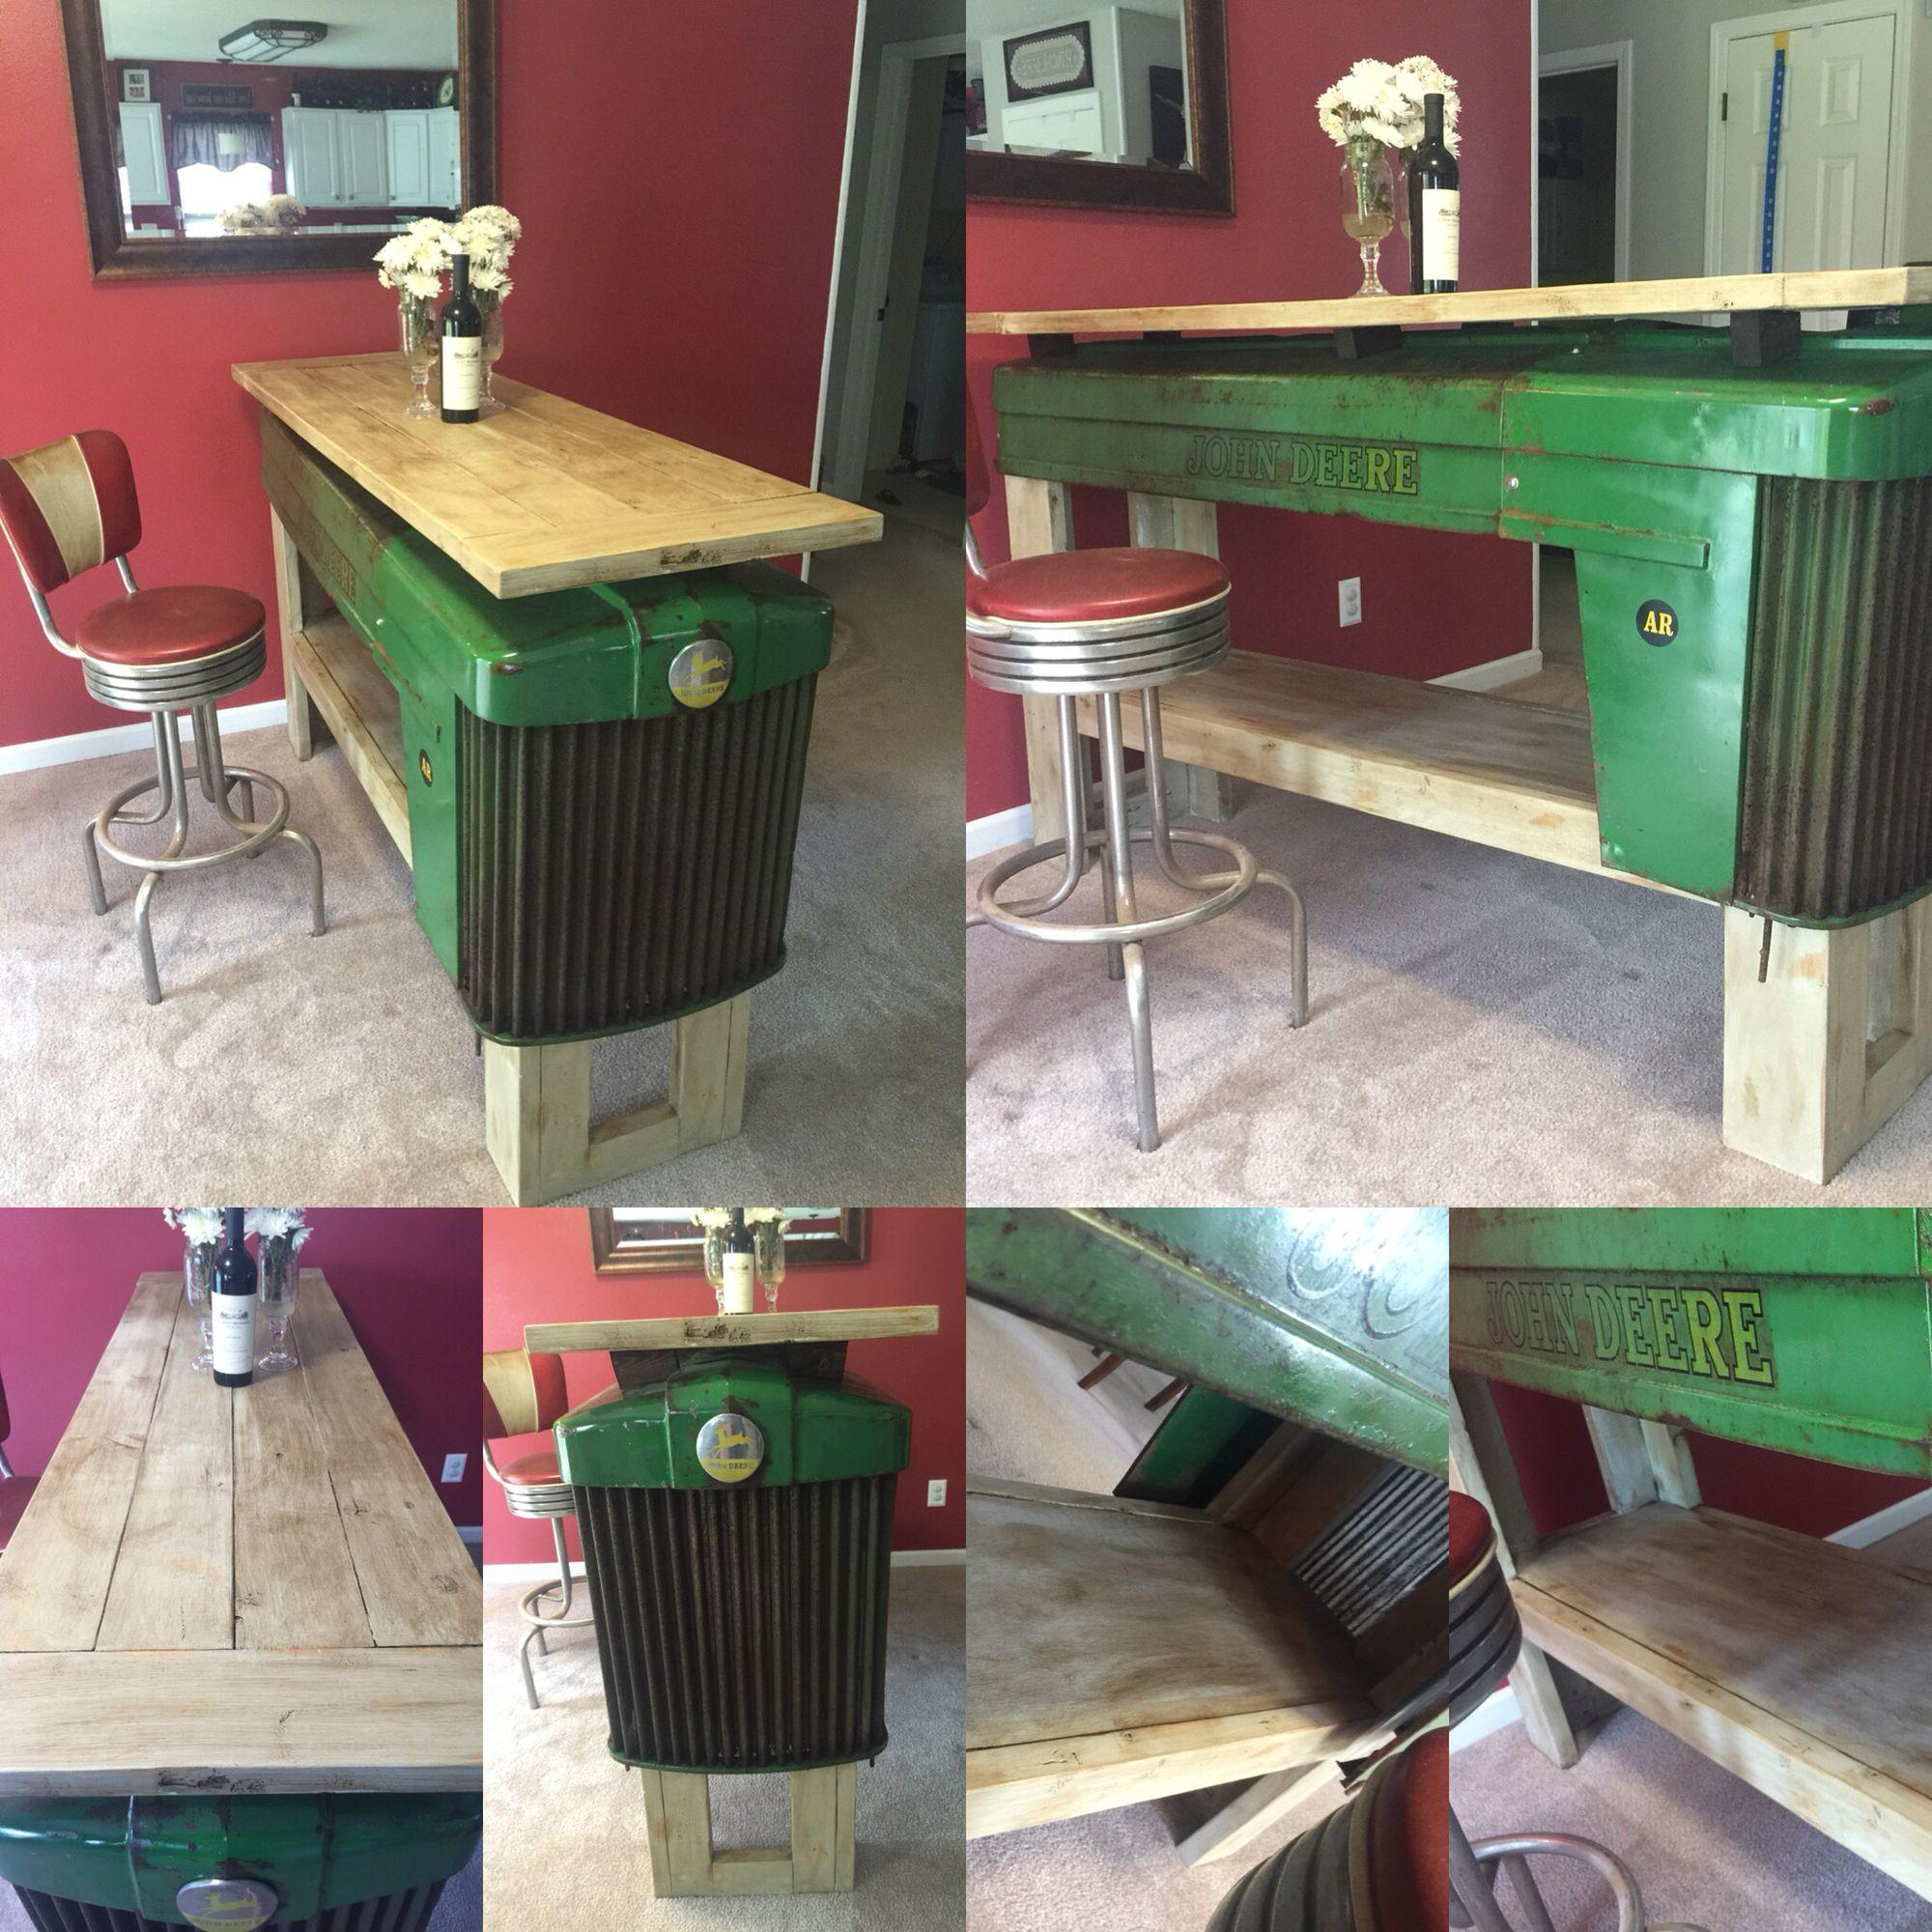 john deere office chair kids club chairs handy hinch original tractor table handyhinch